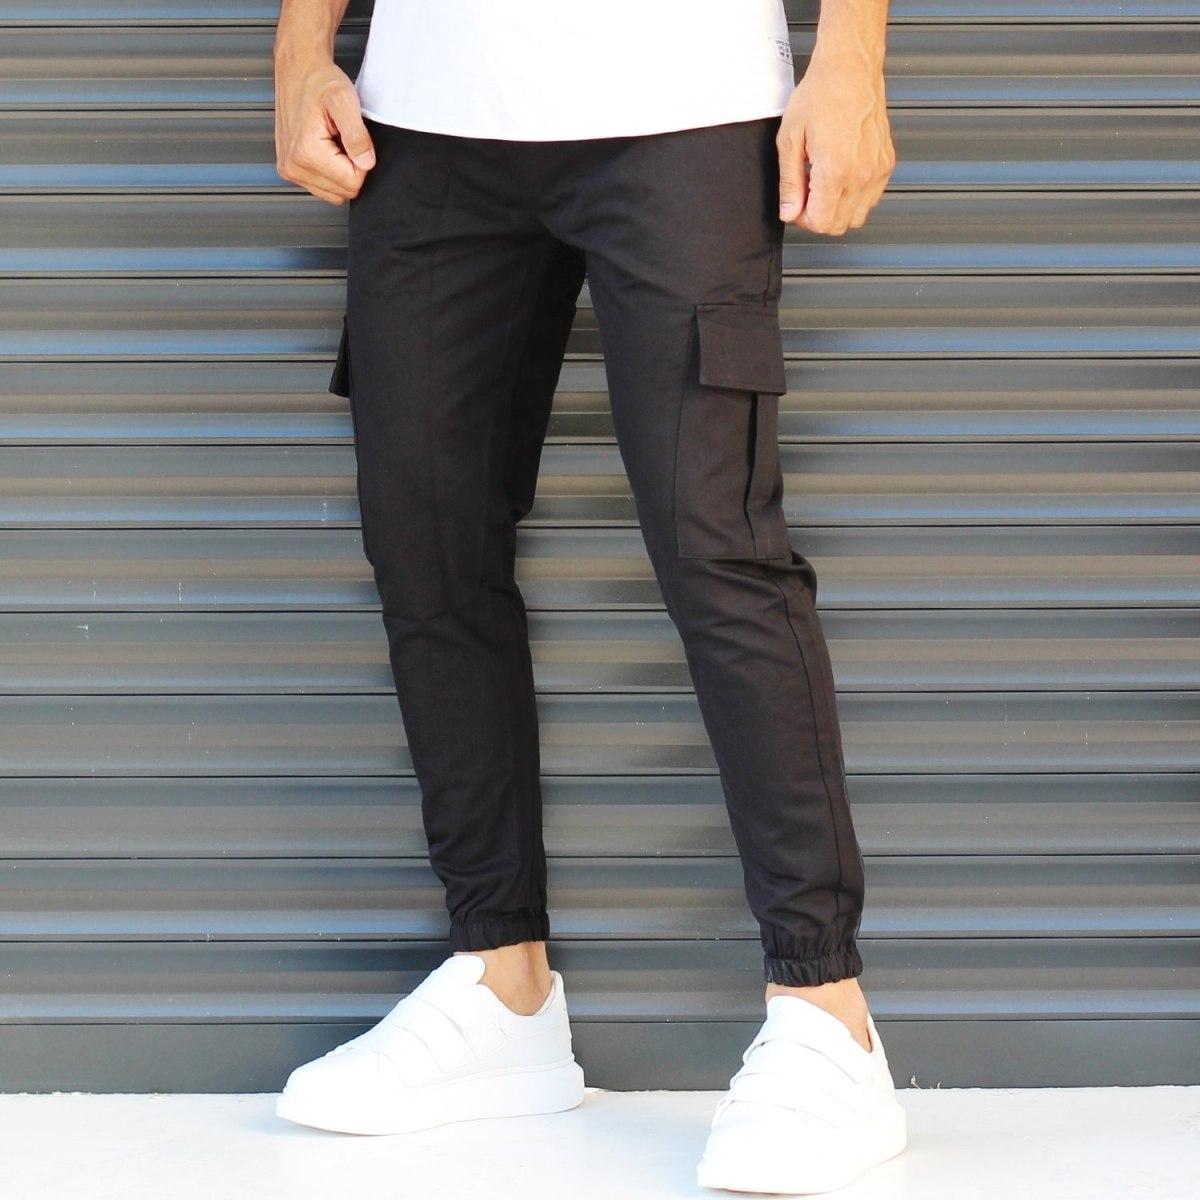 Men's Sport Pants With Side Pockets Black Mv Premium Brand - 3